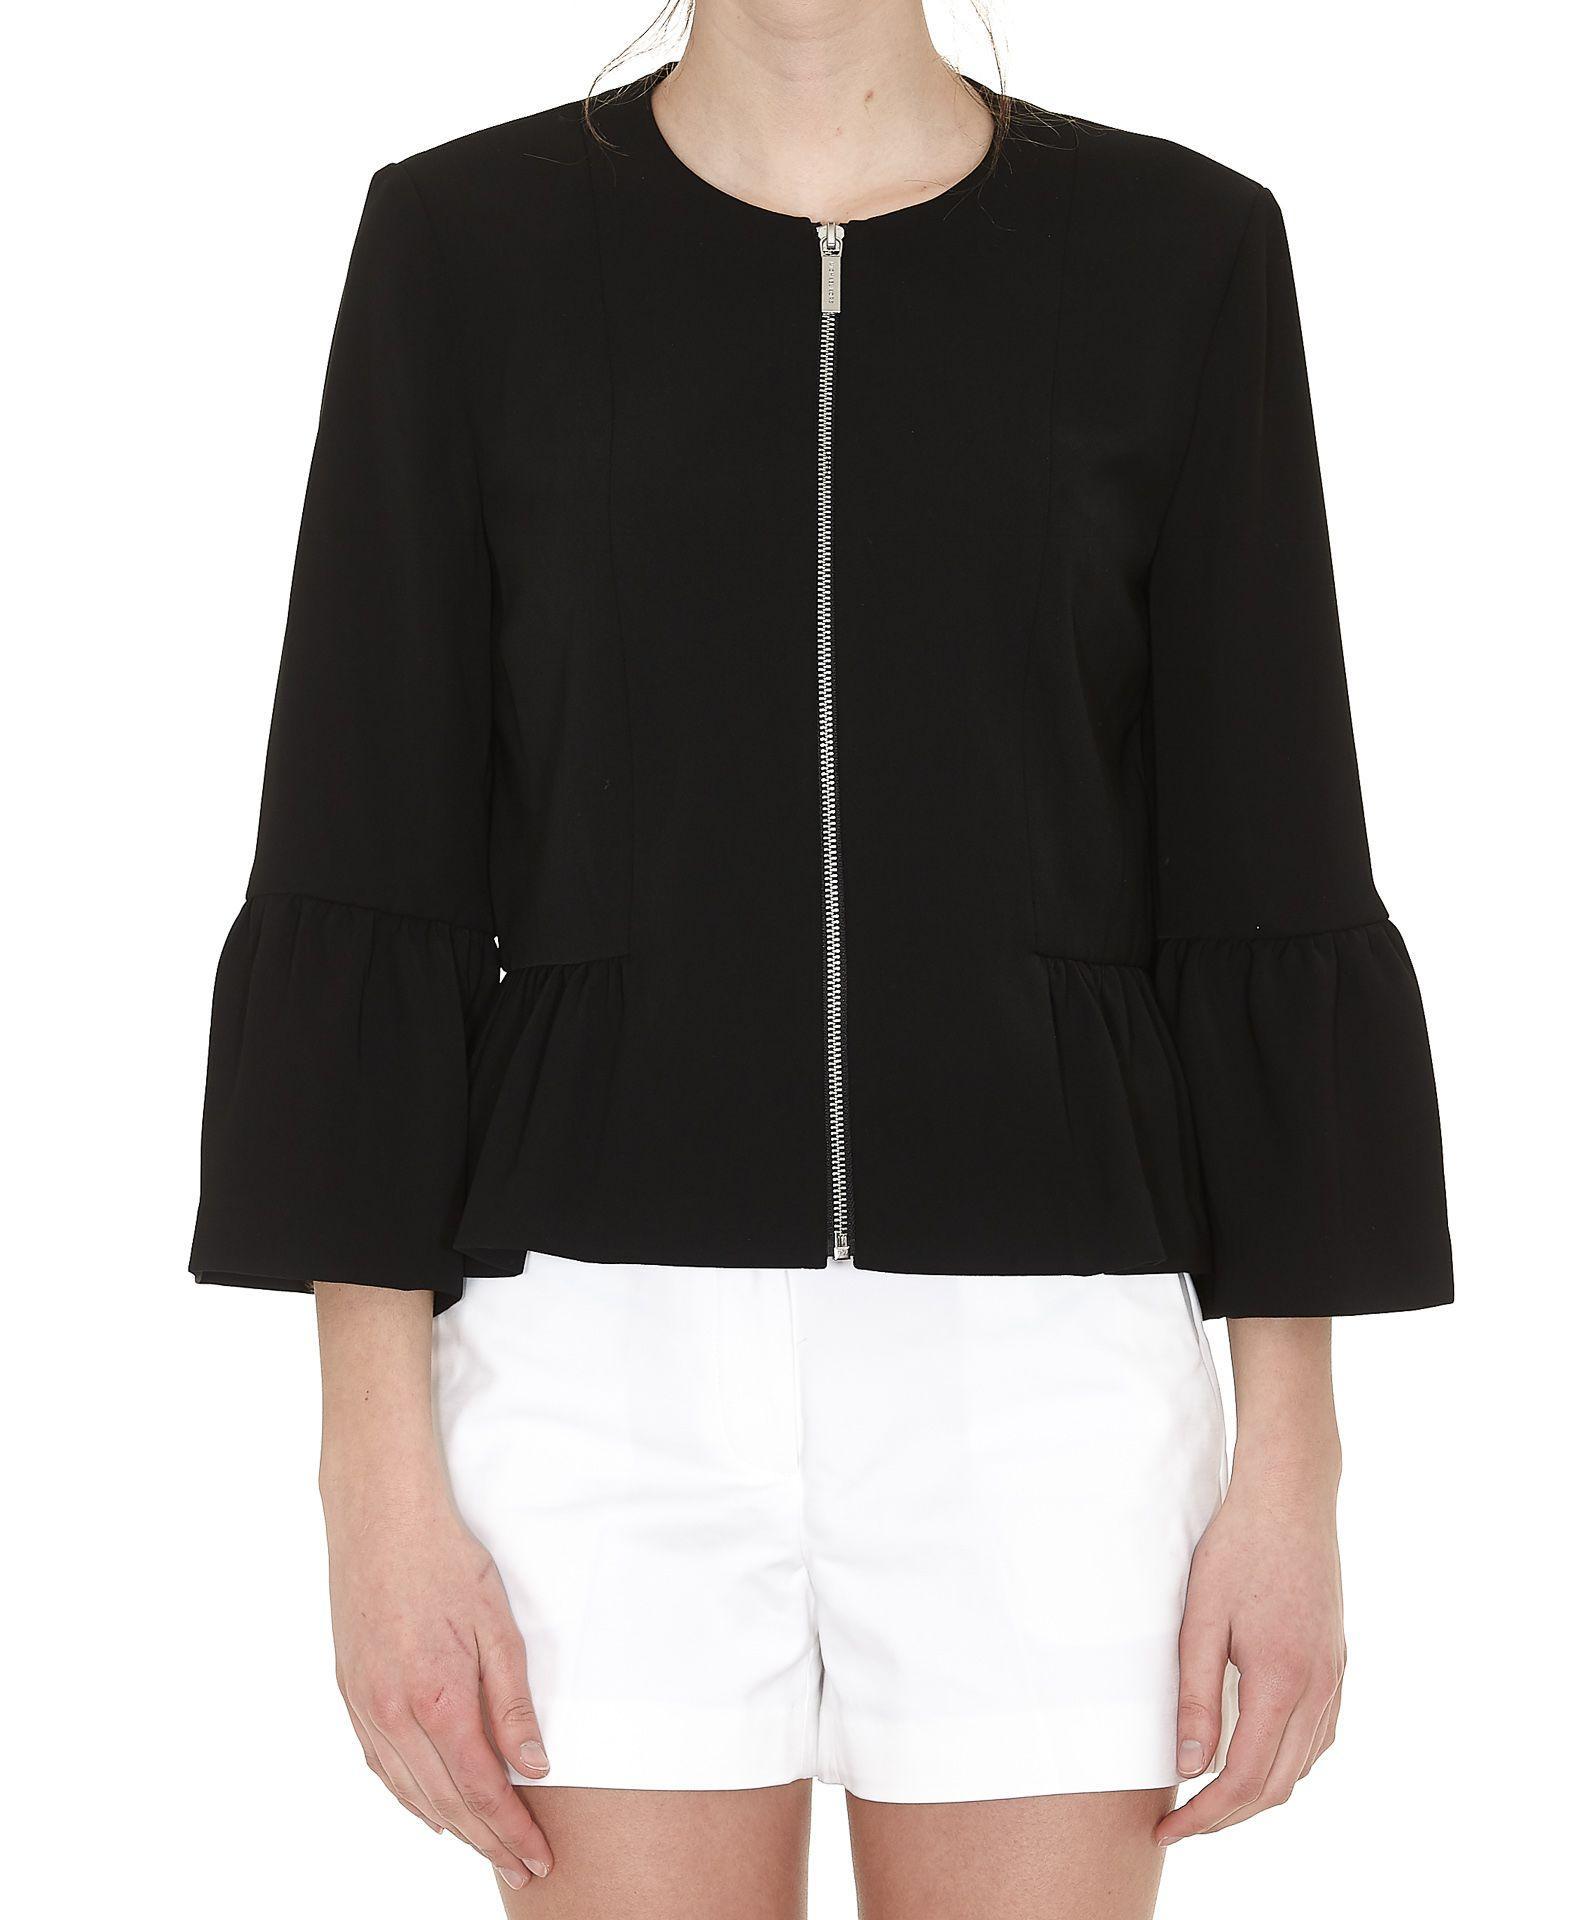 Michael Kors Ruched Peplum Jacket In Black